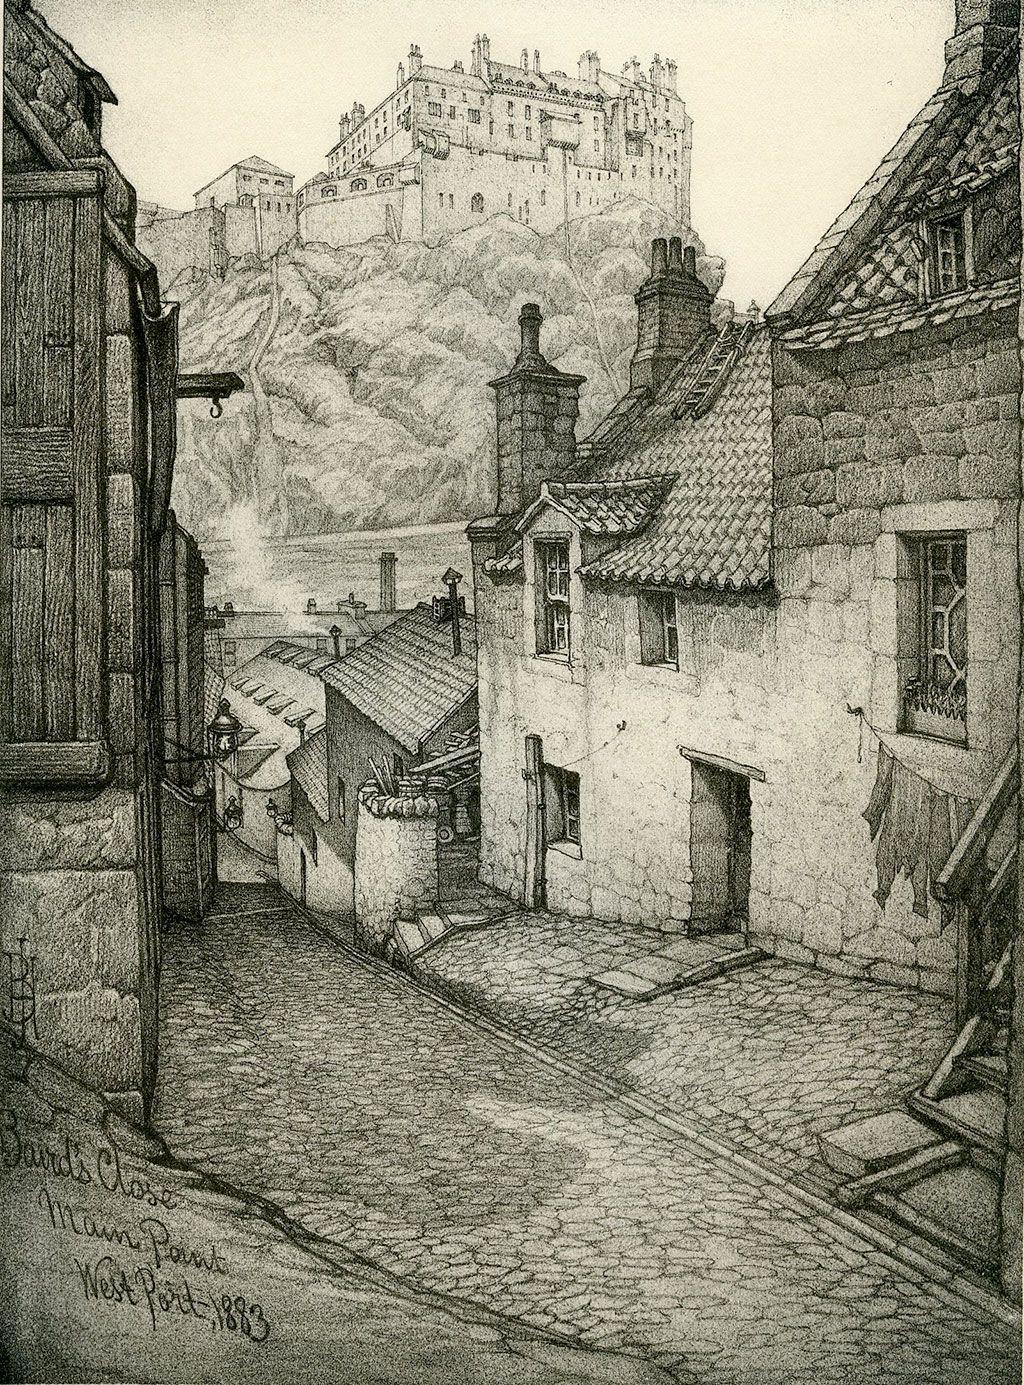 Old Houses of Edinburgh - Drawings by Bruce J Home ...